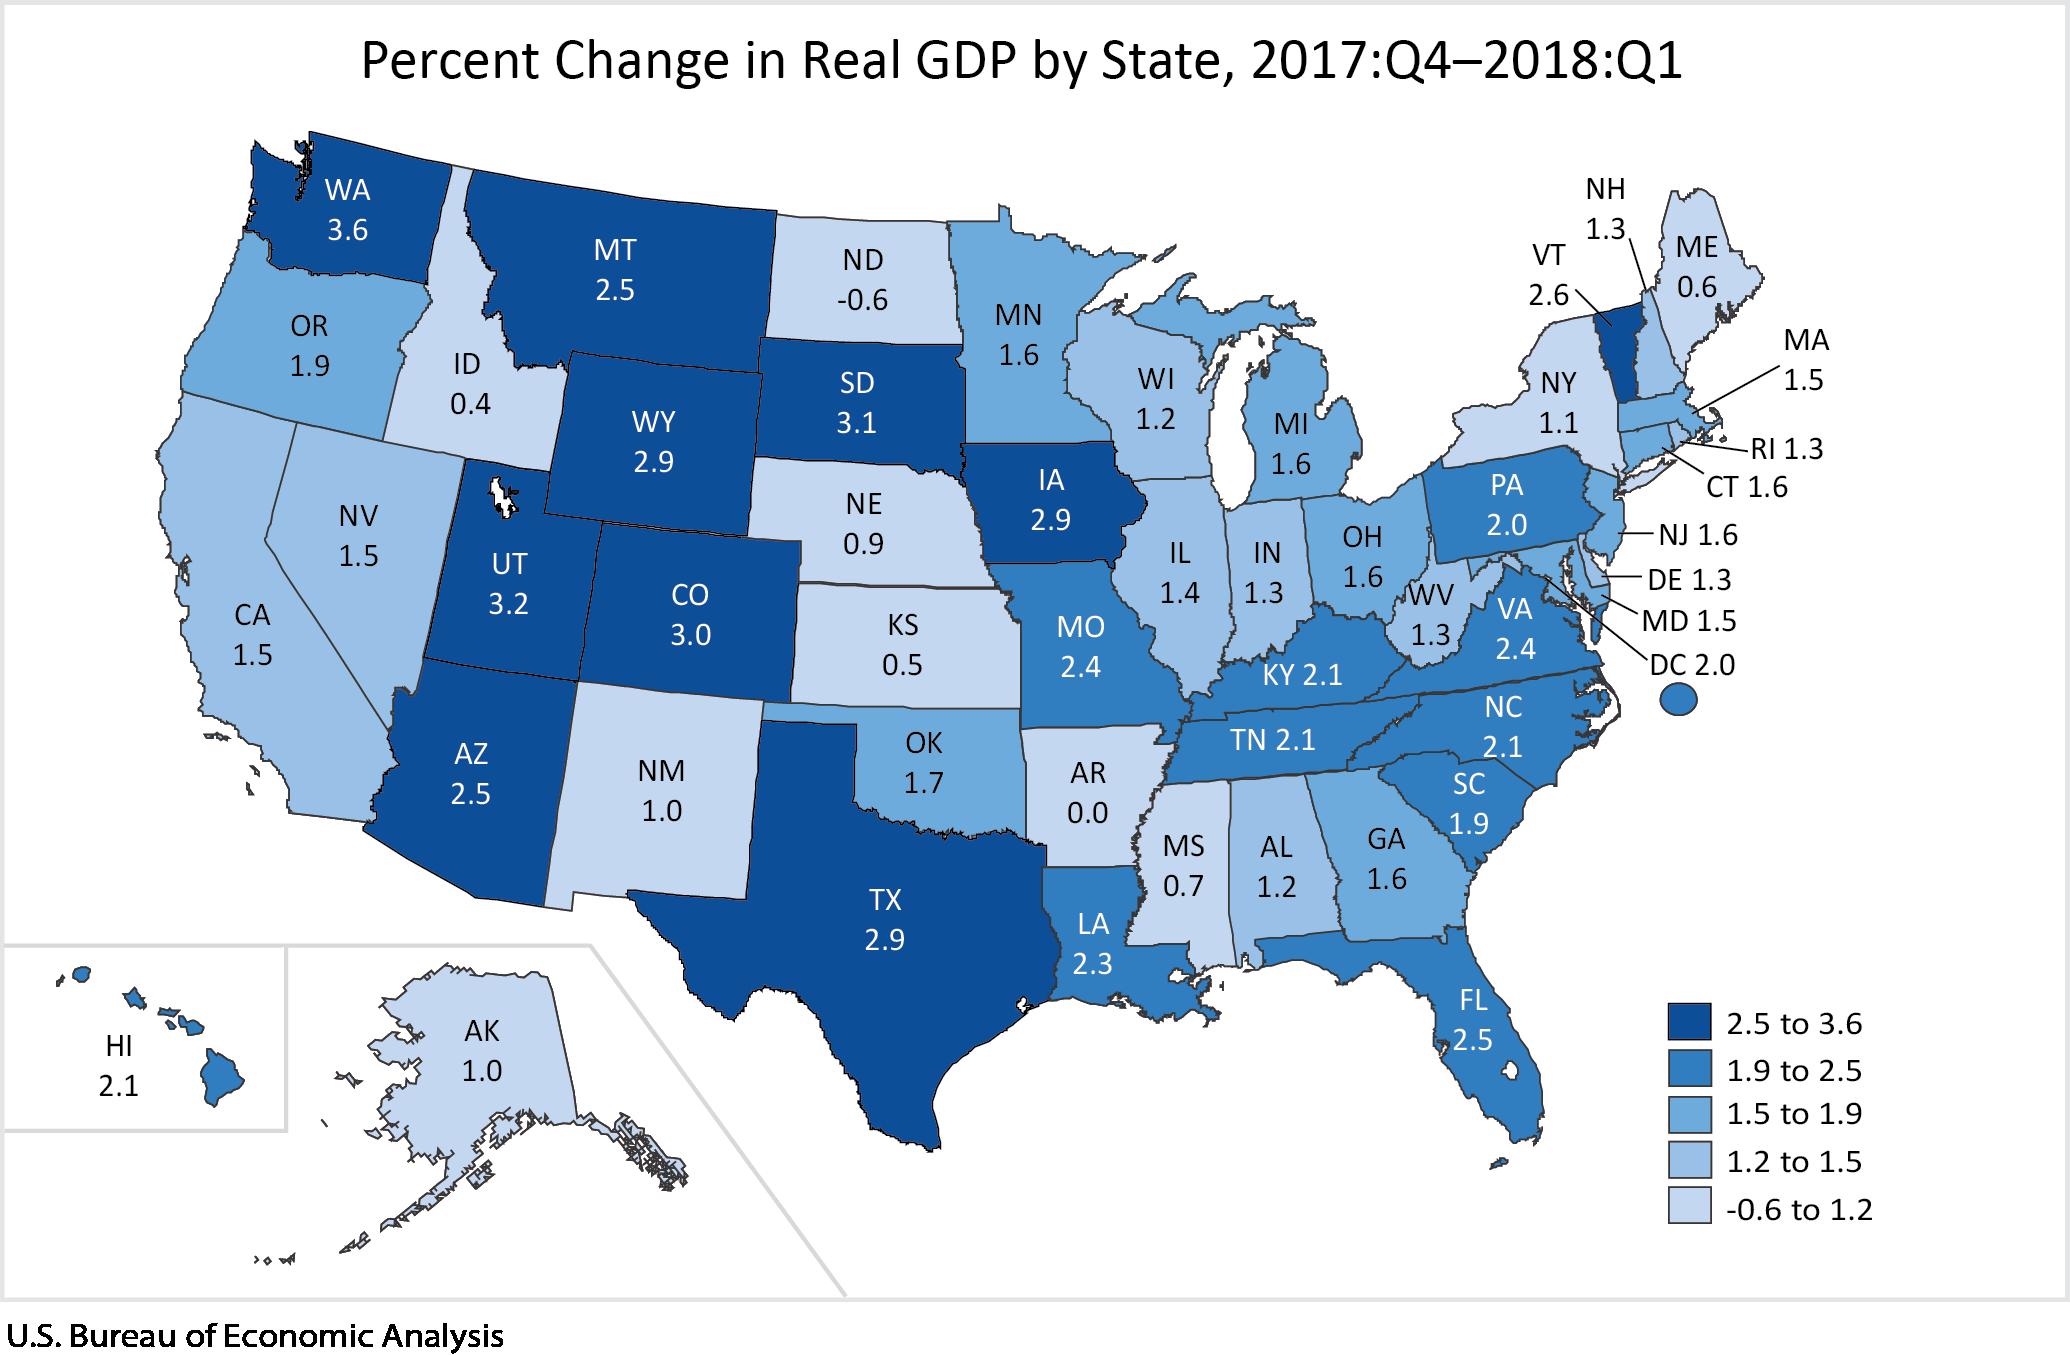 GDP by State | U.S. Bureau of Economic Analysis (BEA)